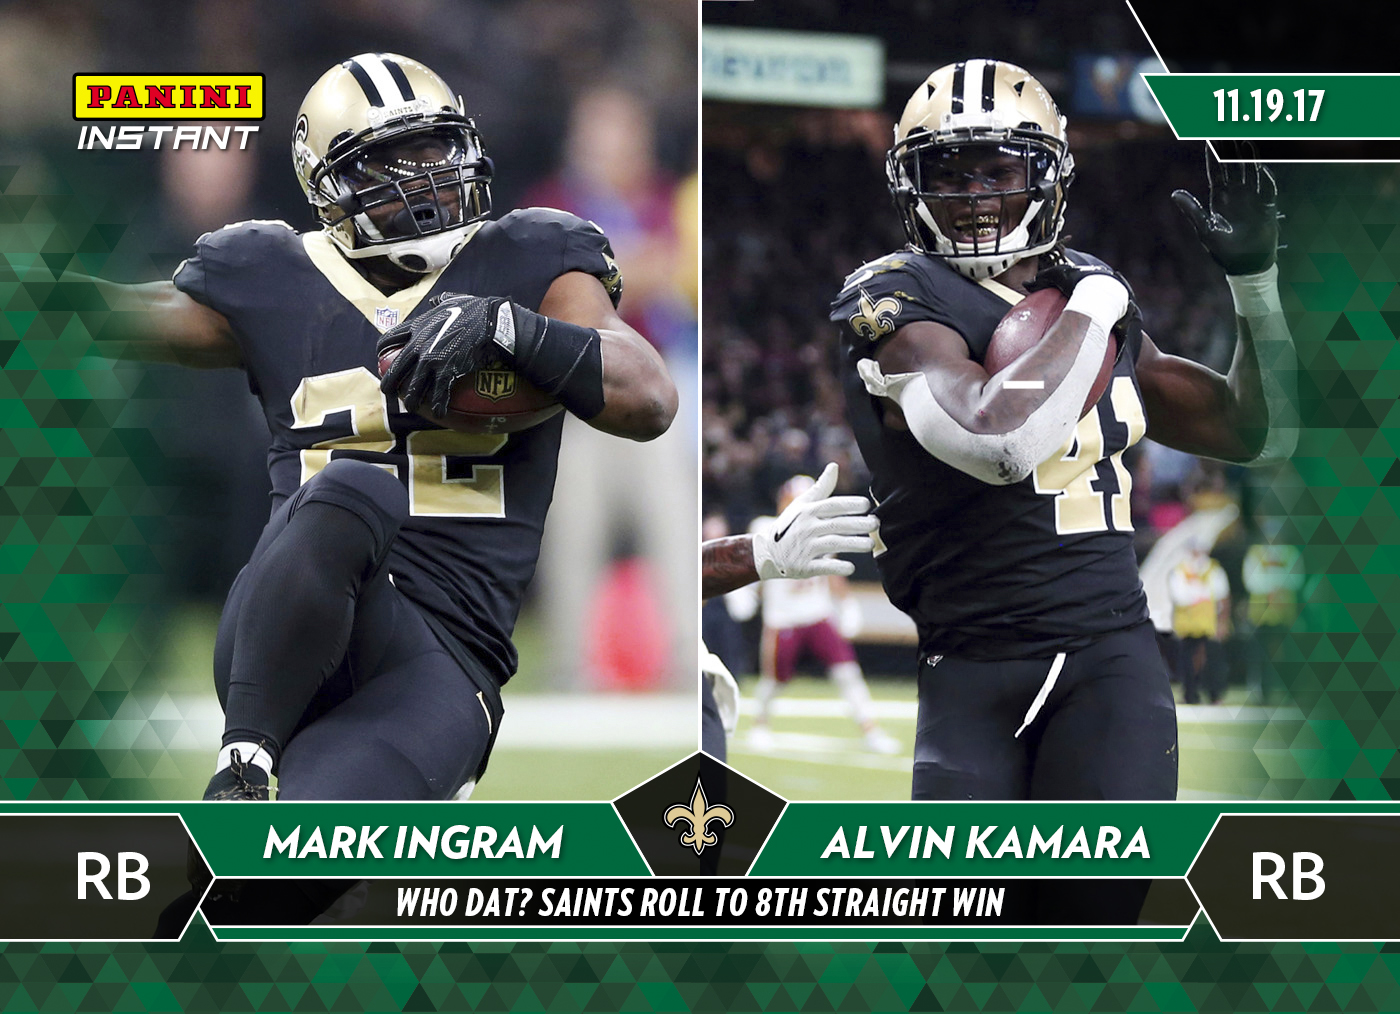 finest selection a9225 60714 Mark Ingram & Alvin Kamara - 2017 Panini Instant NFL #92 ...